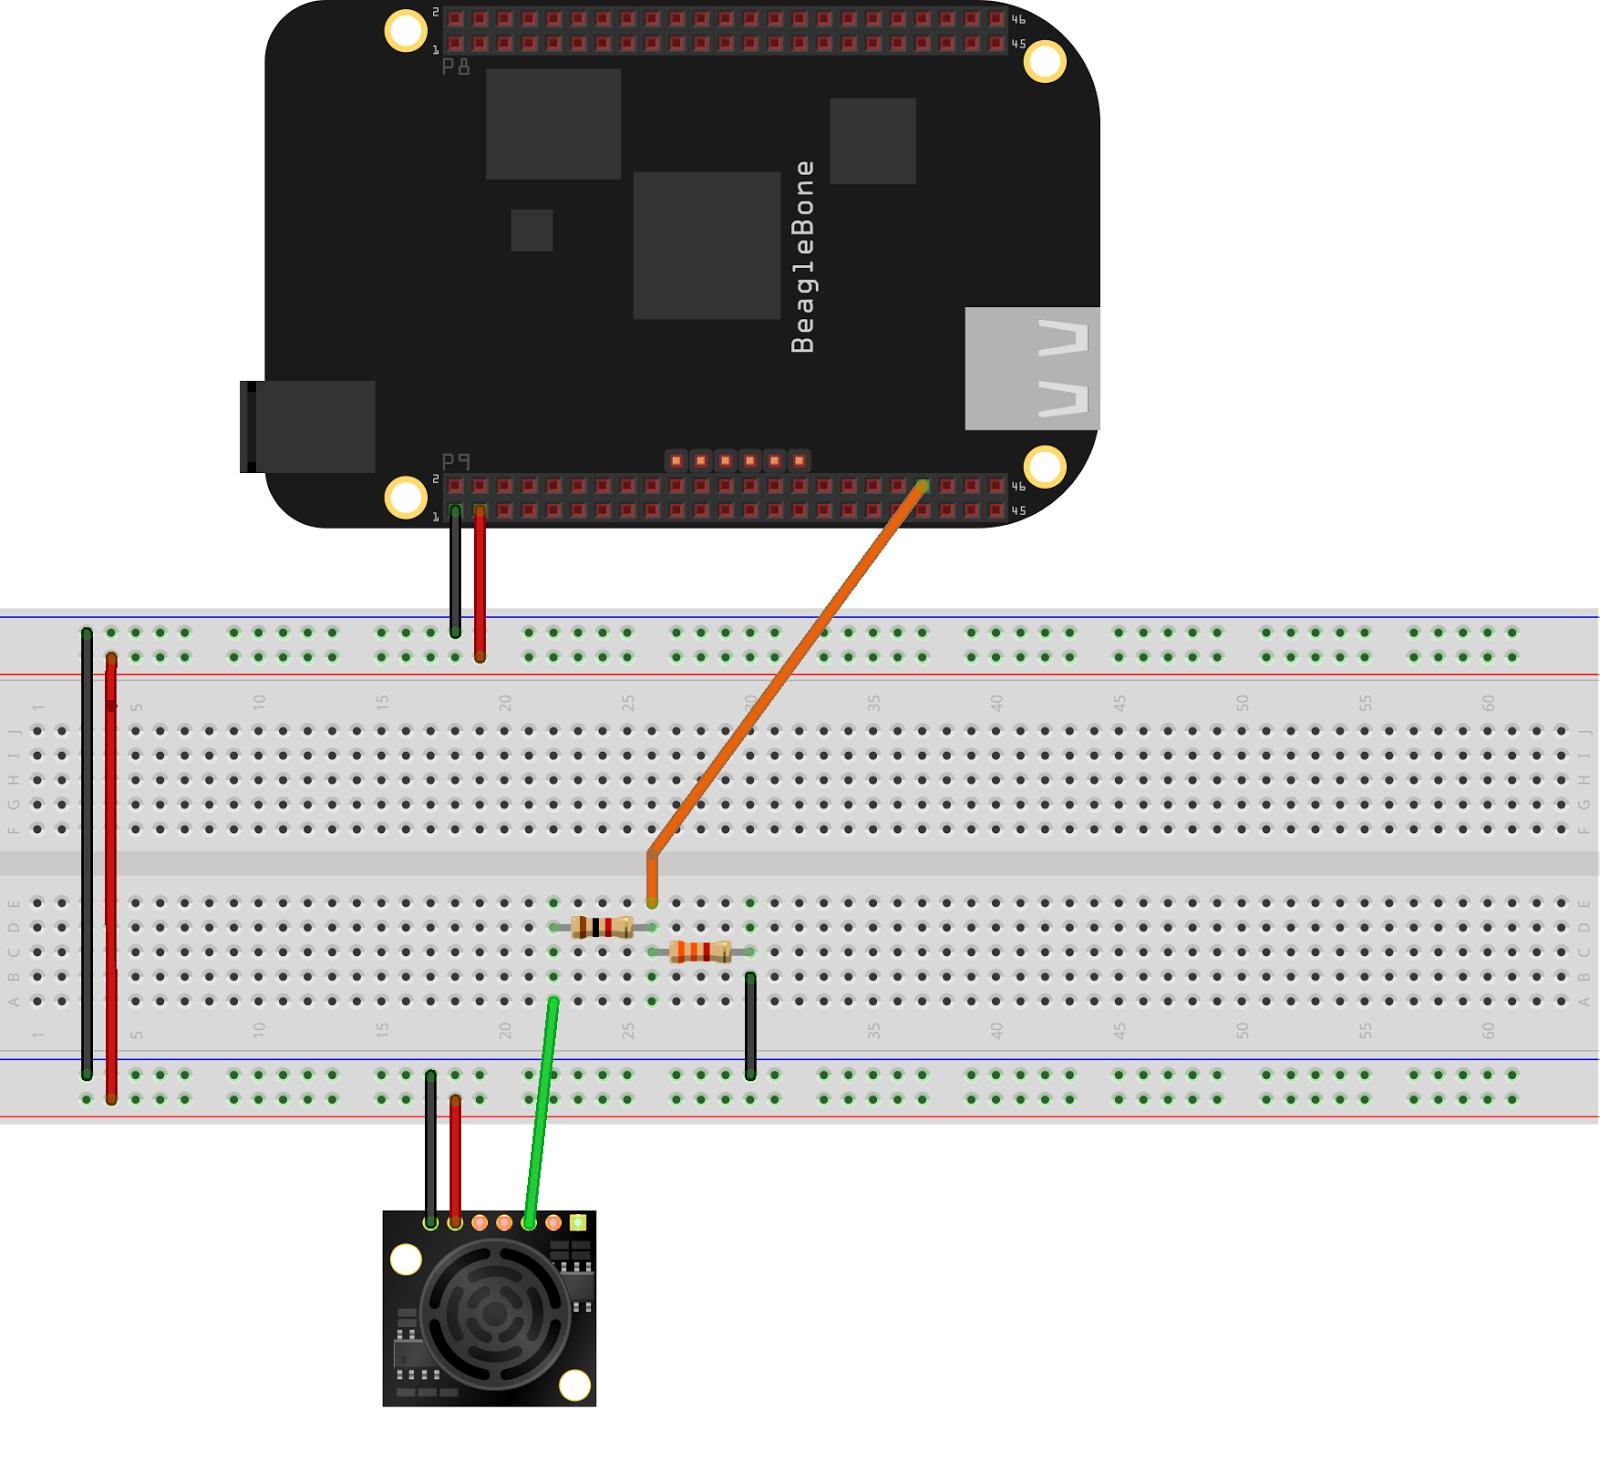 My Adventure in Robotics: BeagleBone Black and the LV